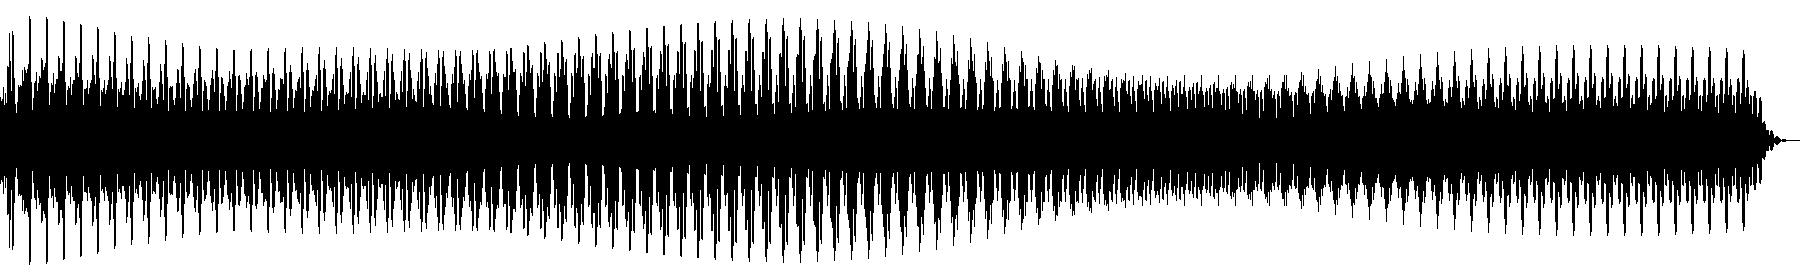 vedh bass cut 112 g